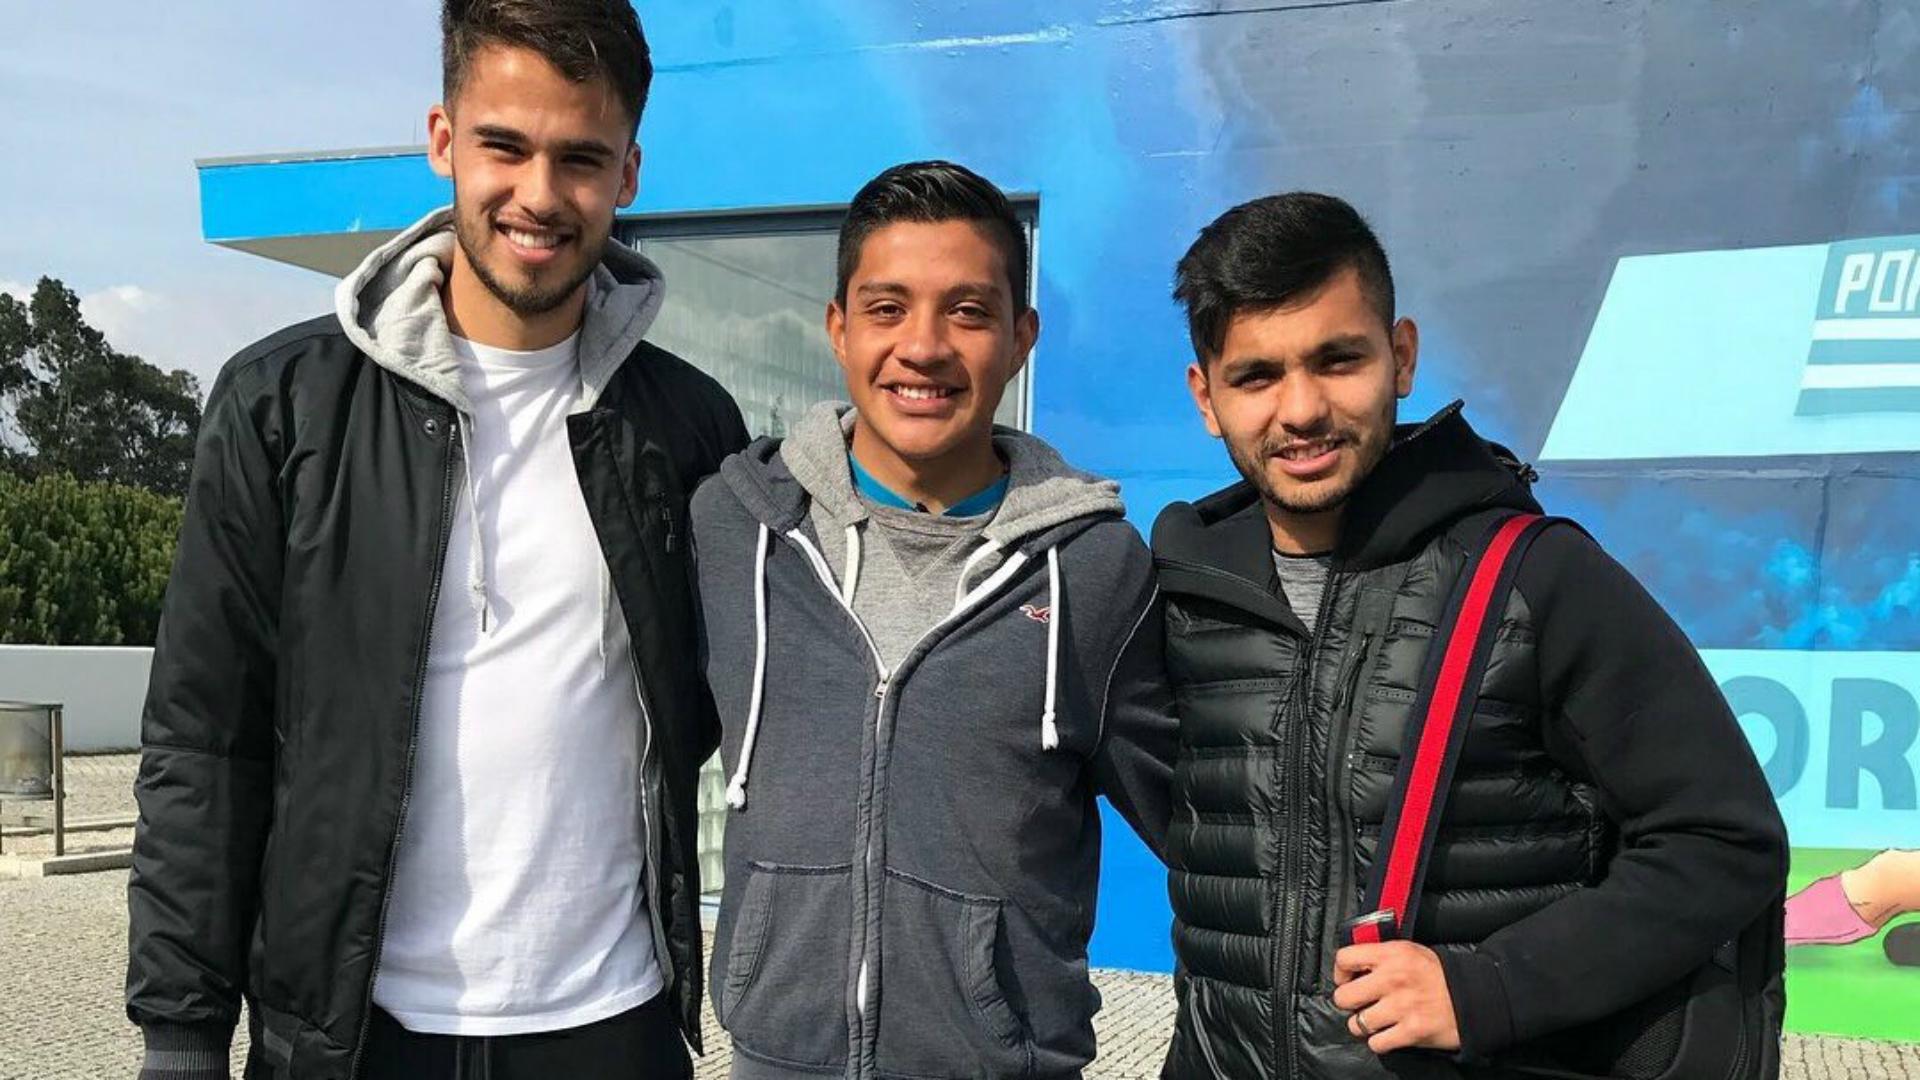 Joven mexicano busca unirse al Porto